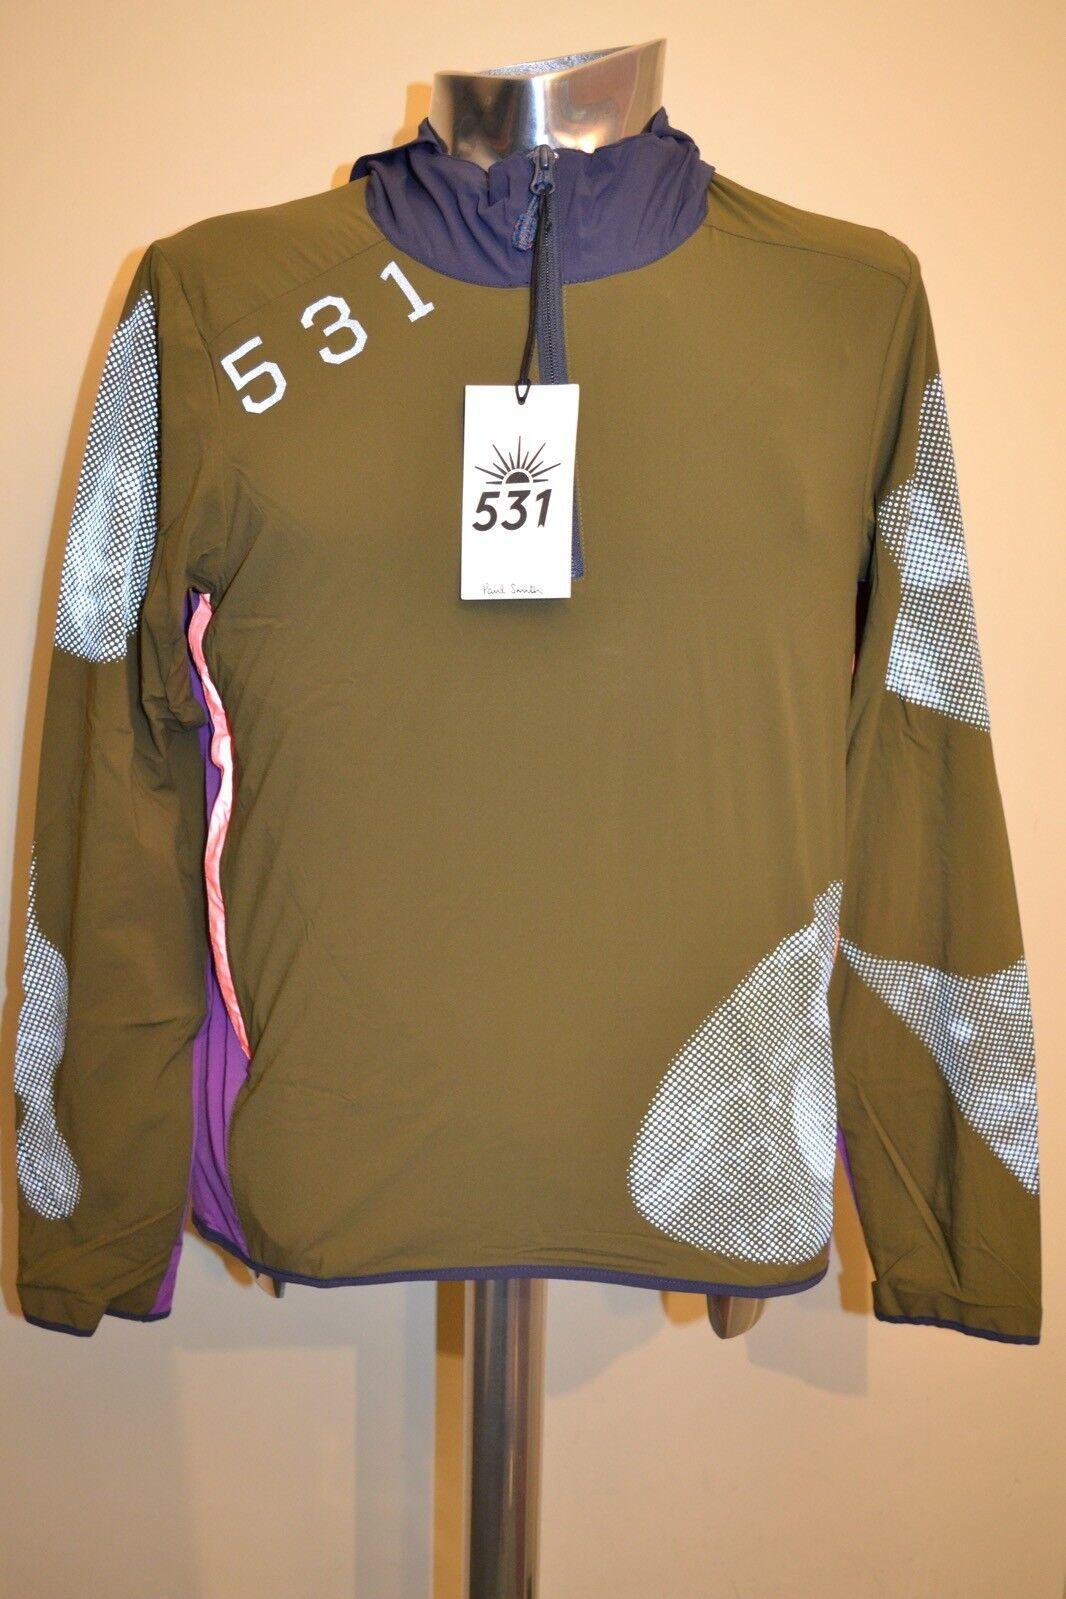 Paul Smith 531 Khaki Showerproof Cycling Hoodie Größe XL New